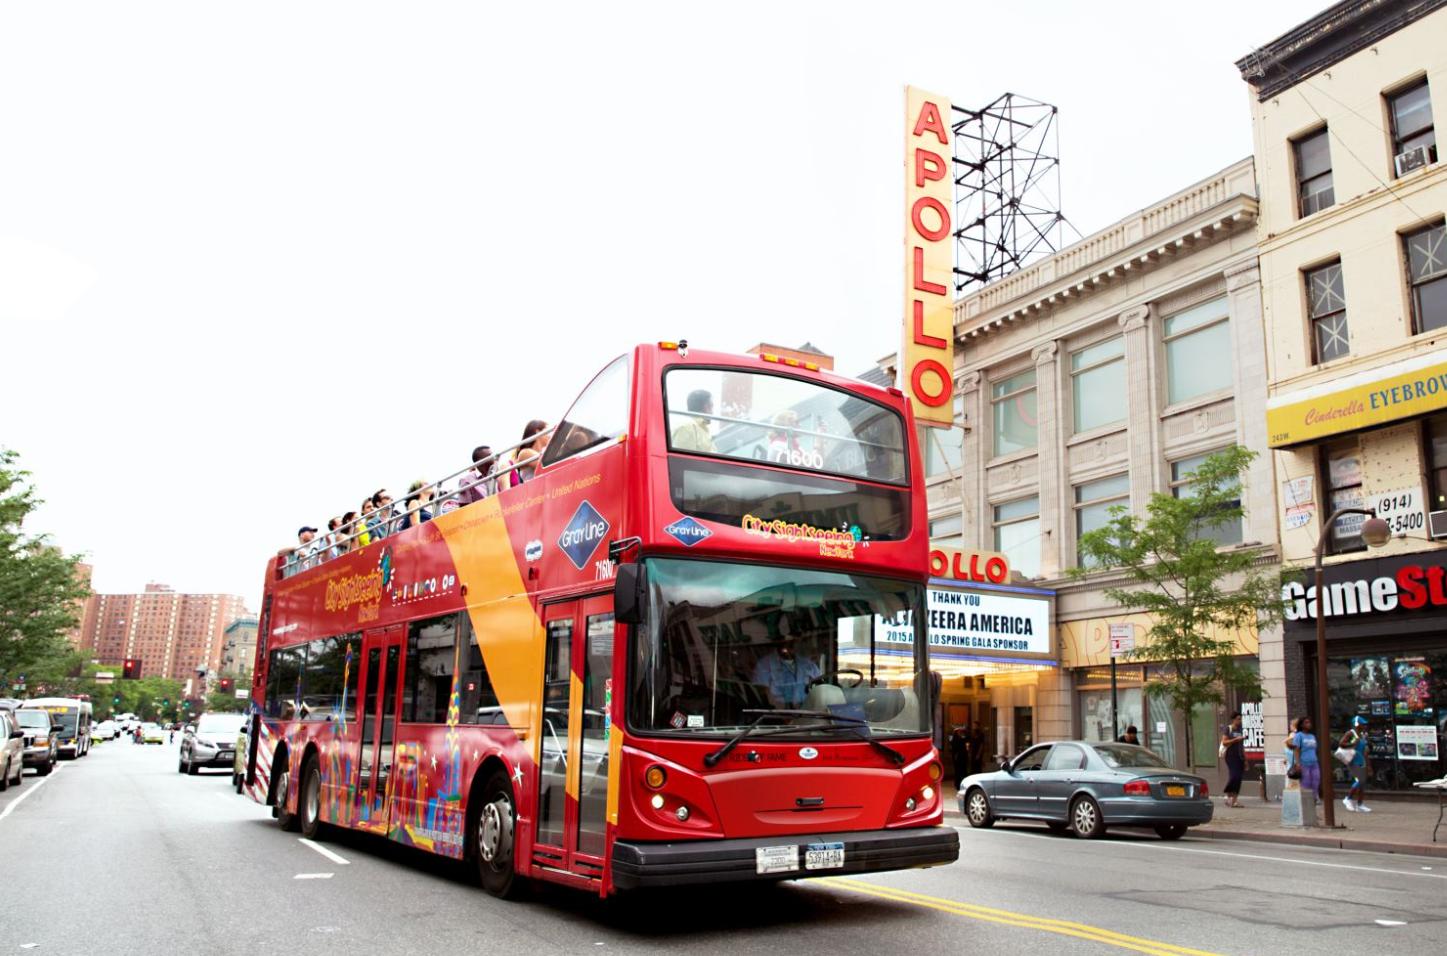 環城雙層巴士48小時隨上隨下 (ALL AROUND TOWN 48 HOUR TOUR)